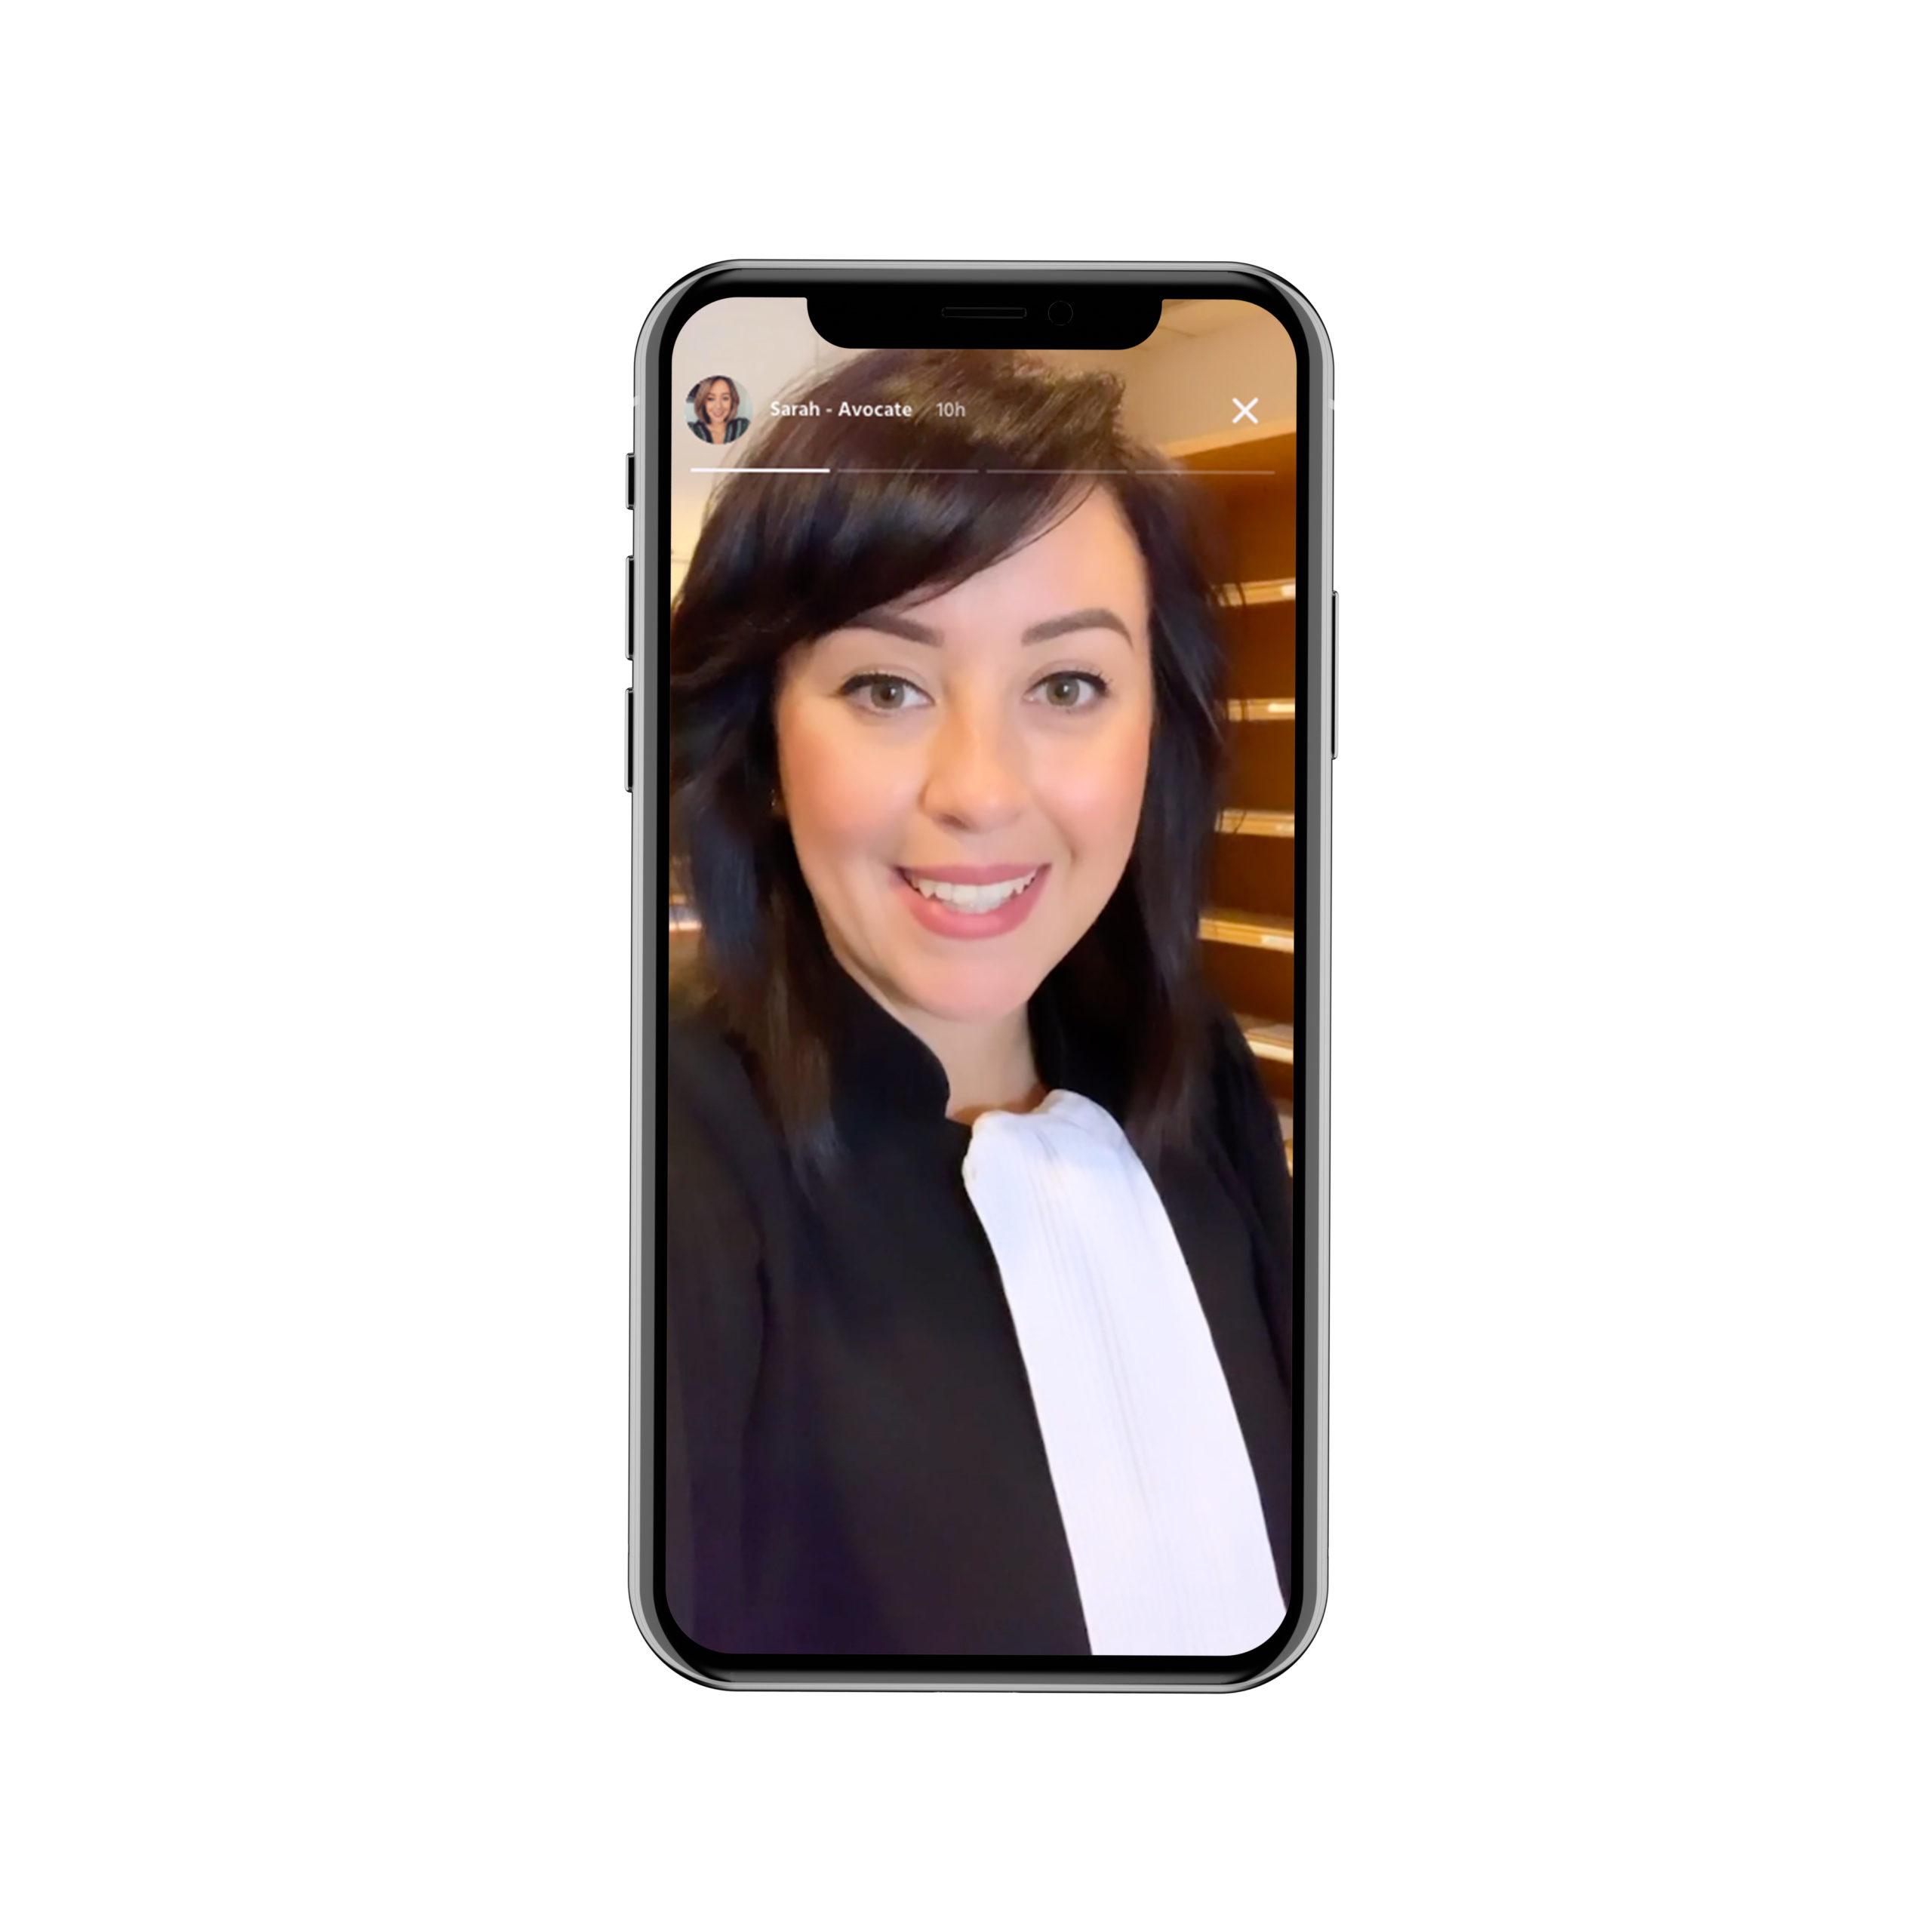 Presse Wilbi -Story avocate application orientation professionnelle